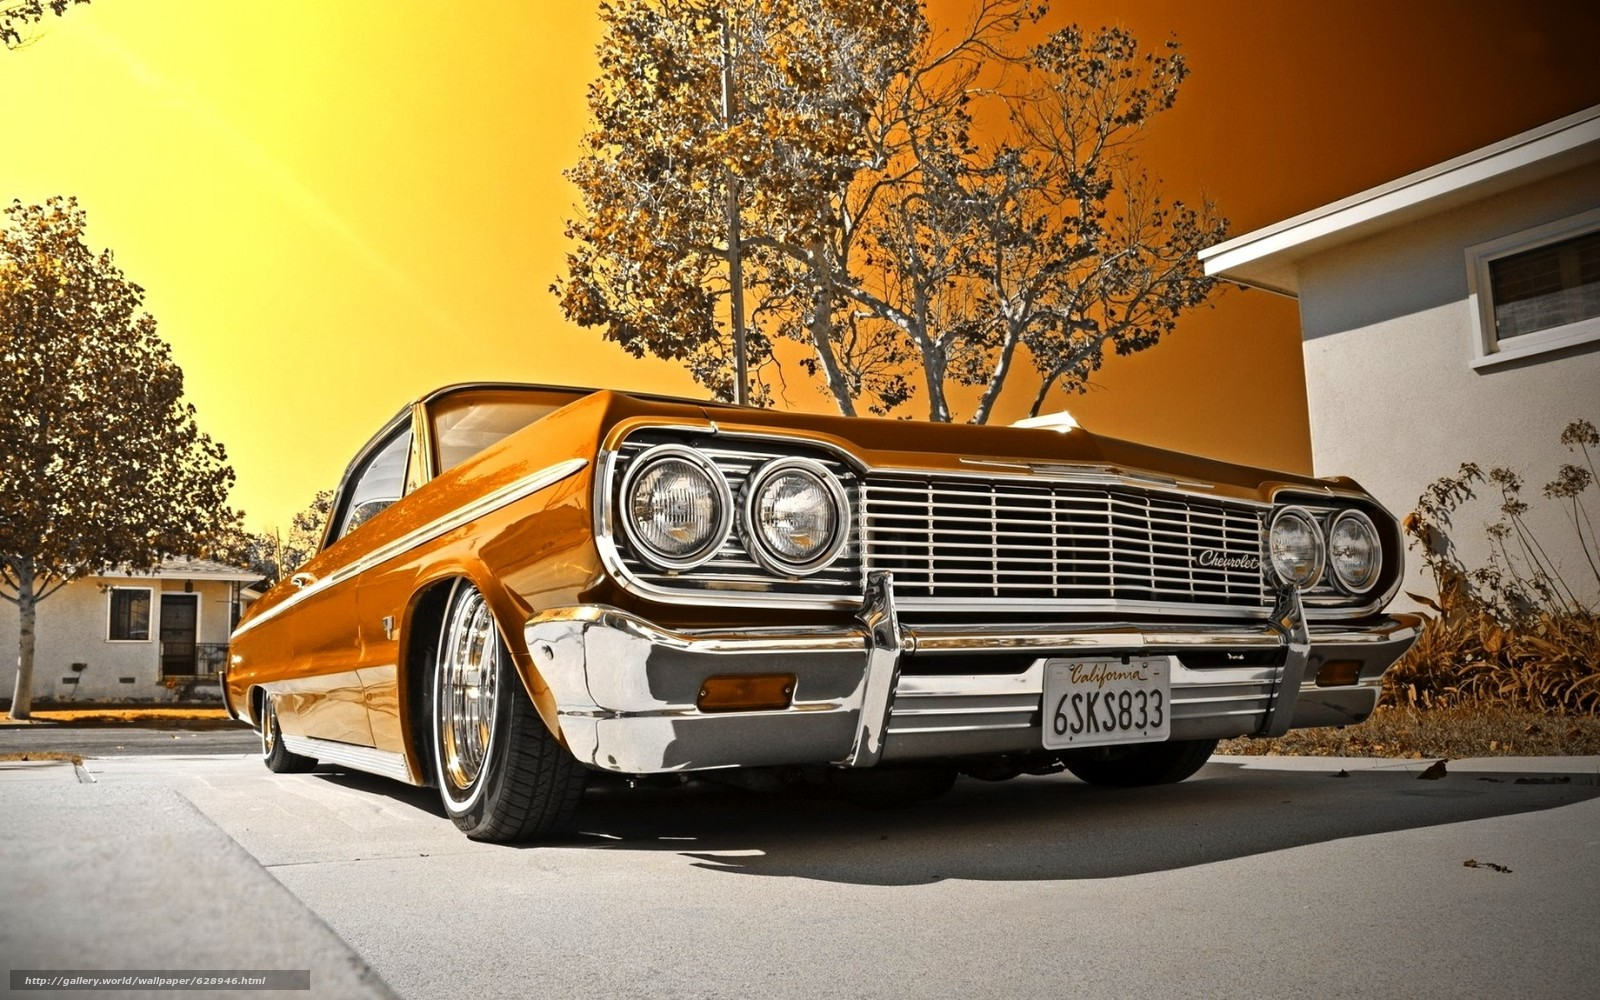 1964, Chevrolet, Impala, Convertible, Lowrider, �������, ������